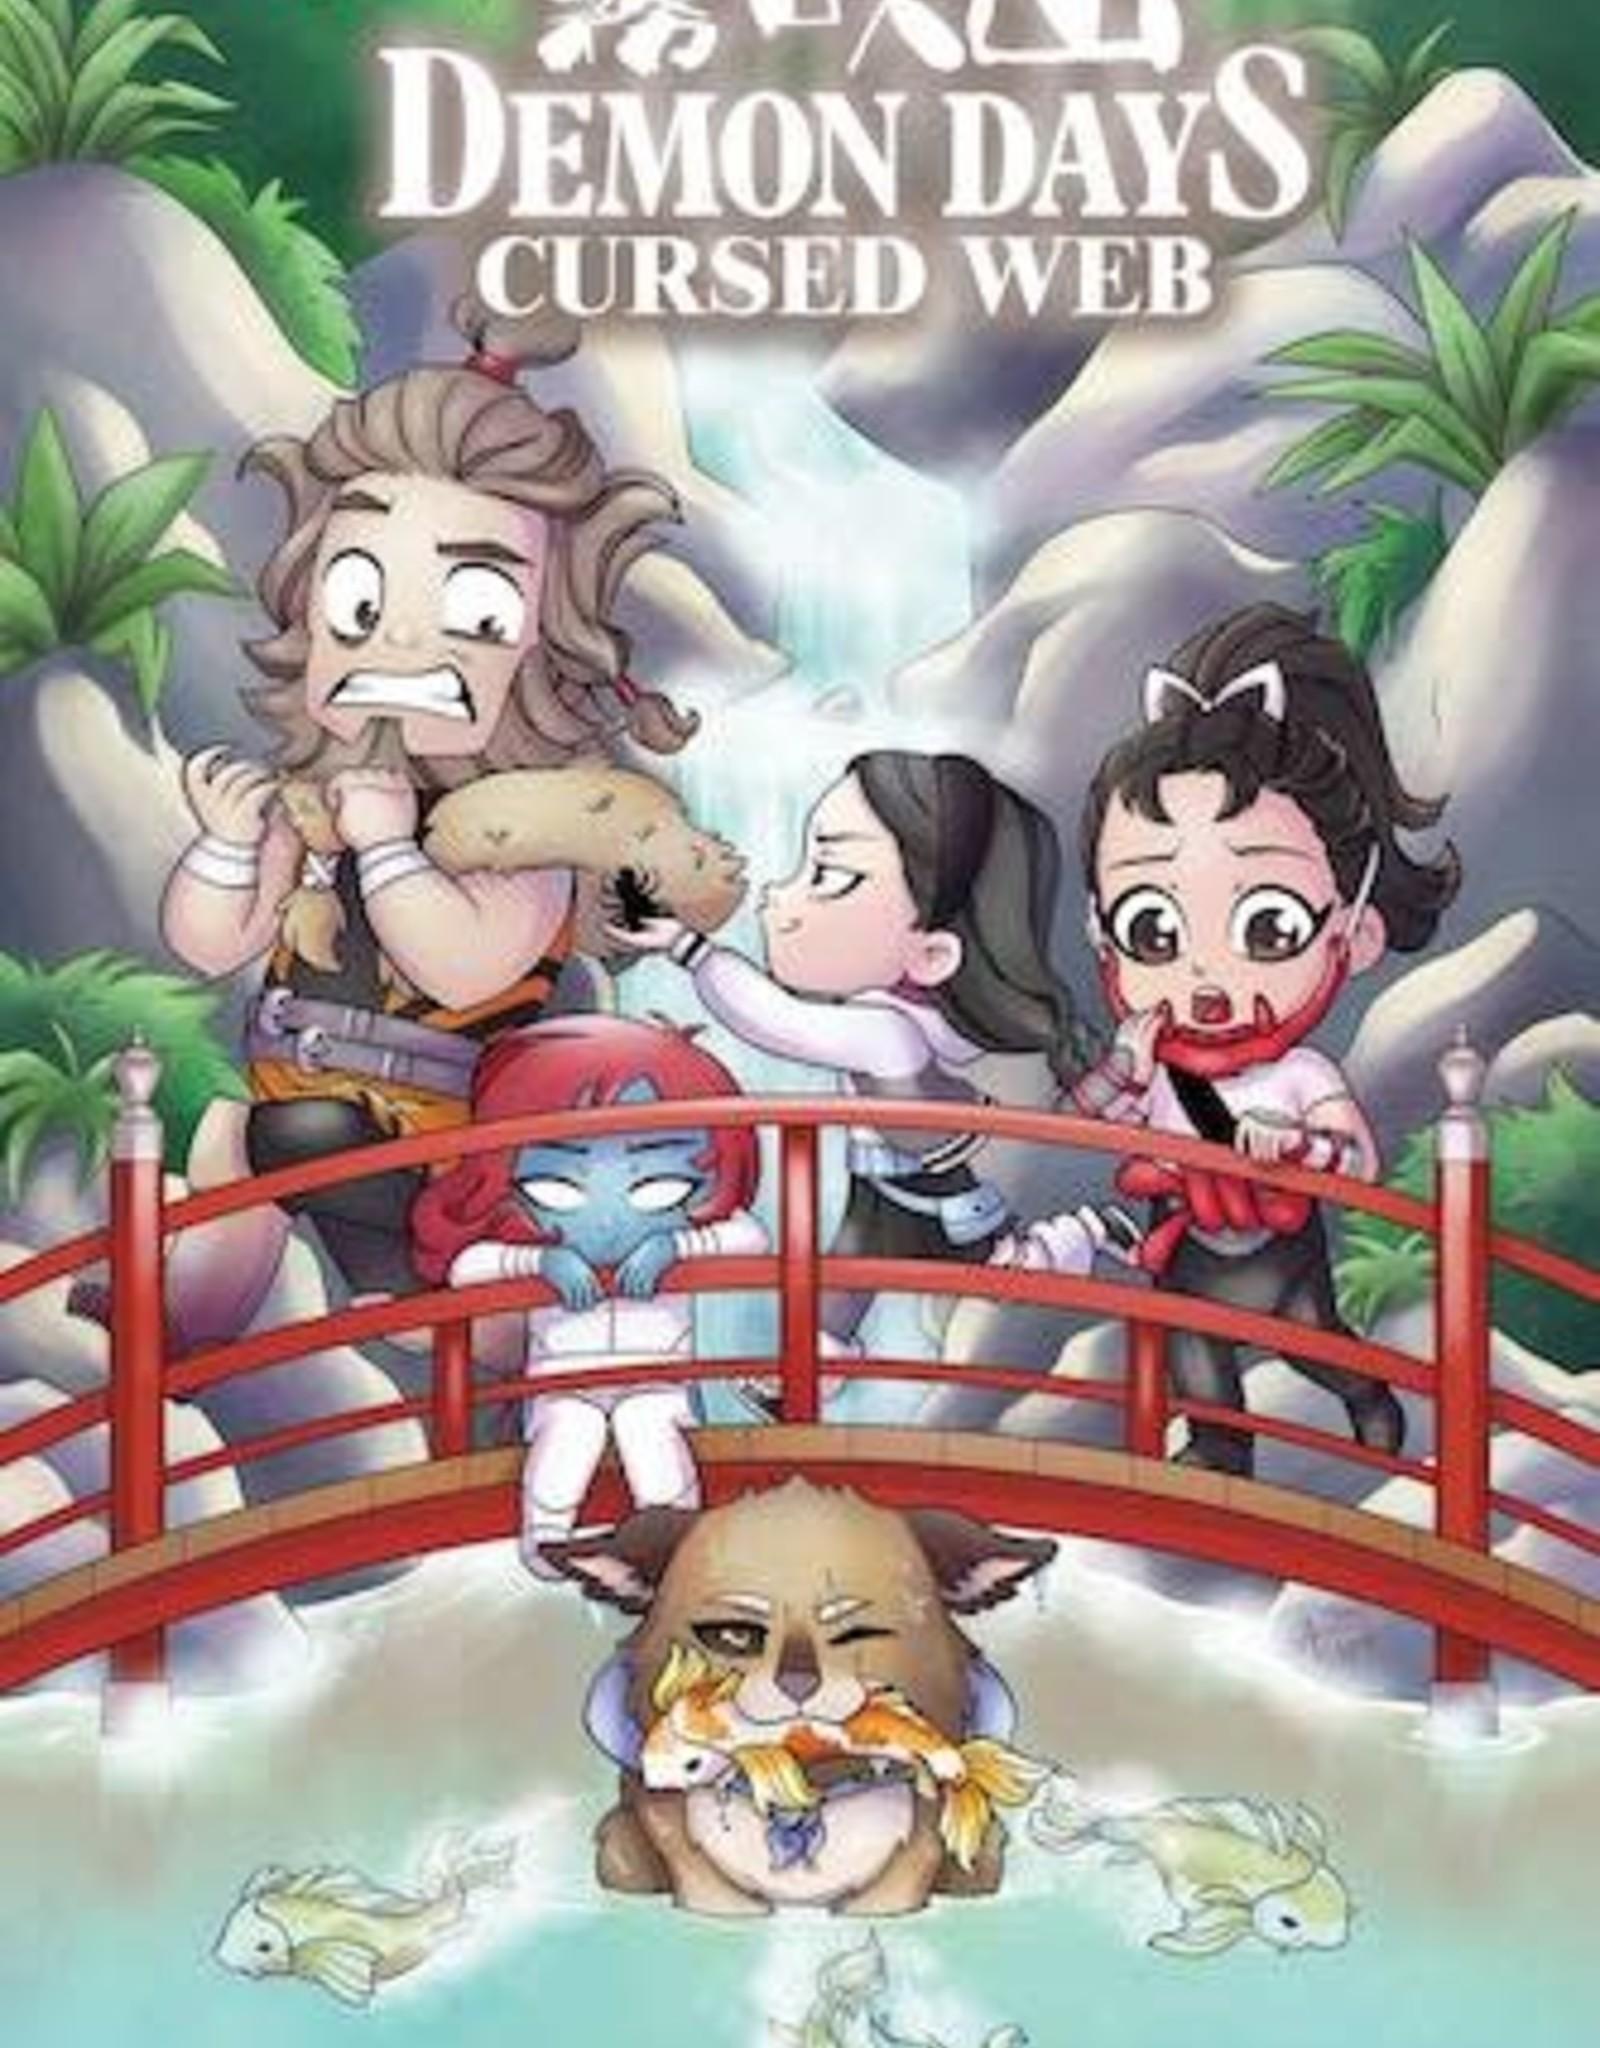 Marvel Comics Demon Days Cursed Web #1 Garbowska Var